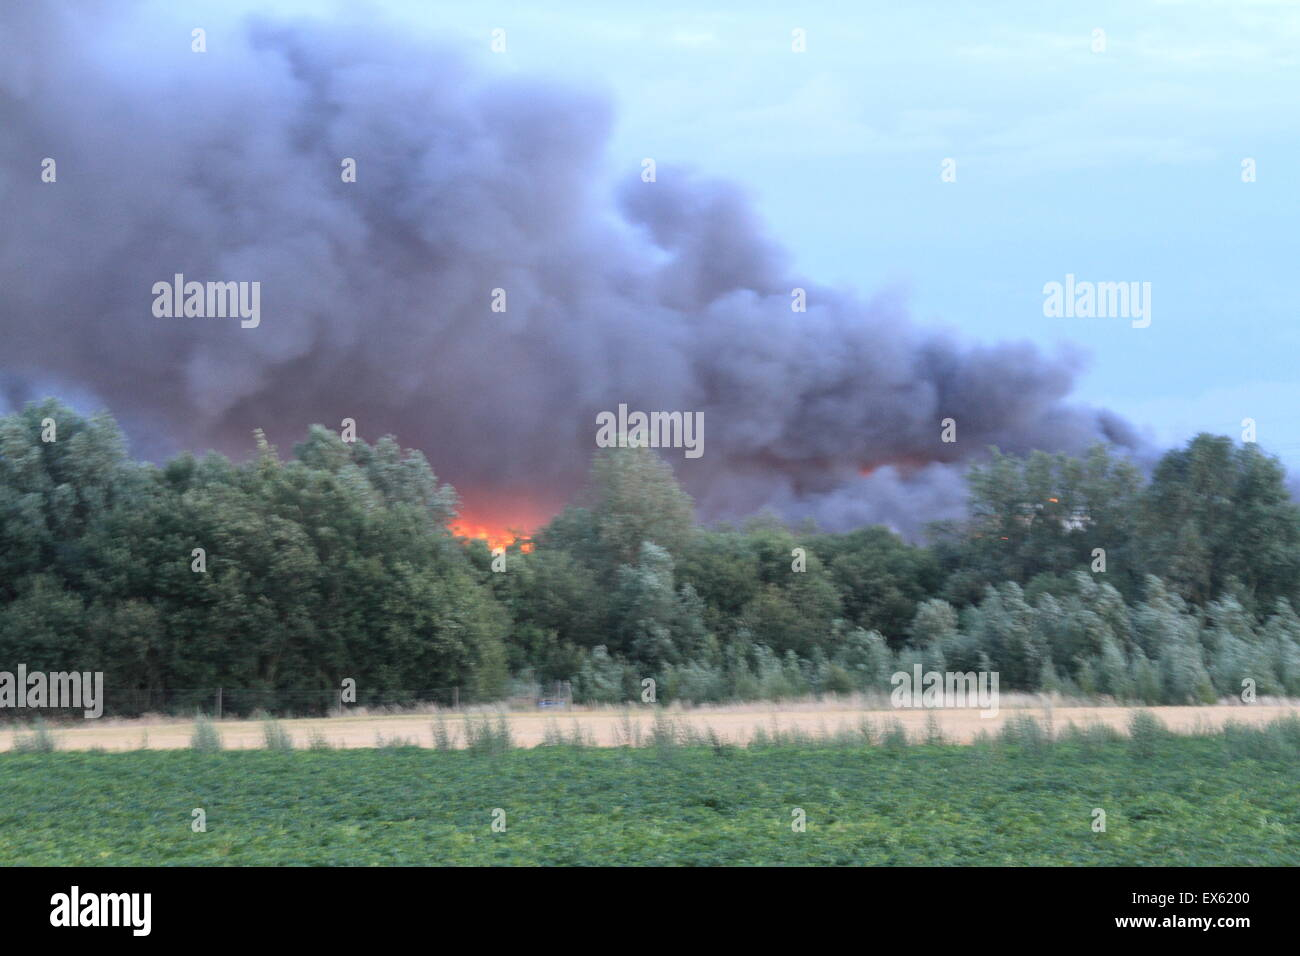 Rainham, London, UK. Tuesday 7th July 2015. Over 80 Firefighters tackle blaze in a pallet Yard in Rainham. 12 Fire Stock Photo